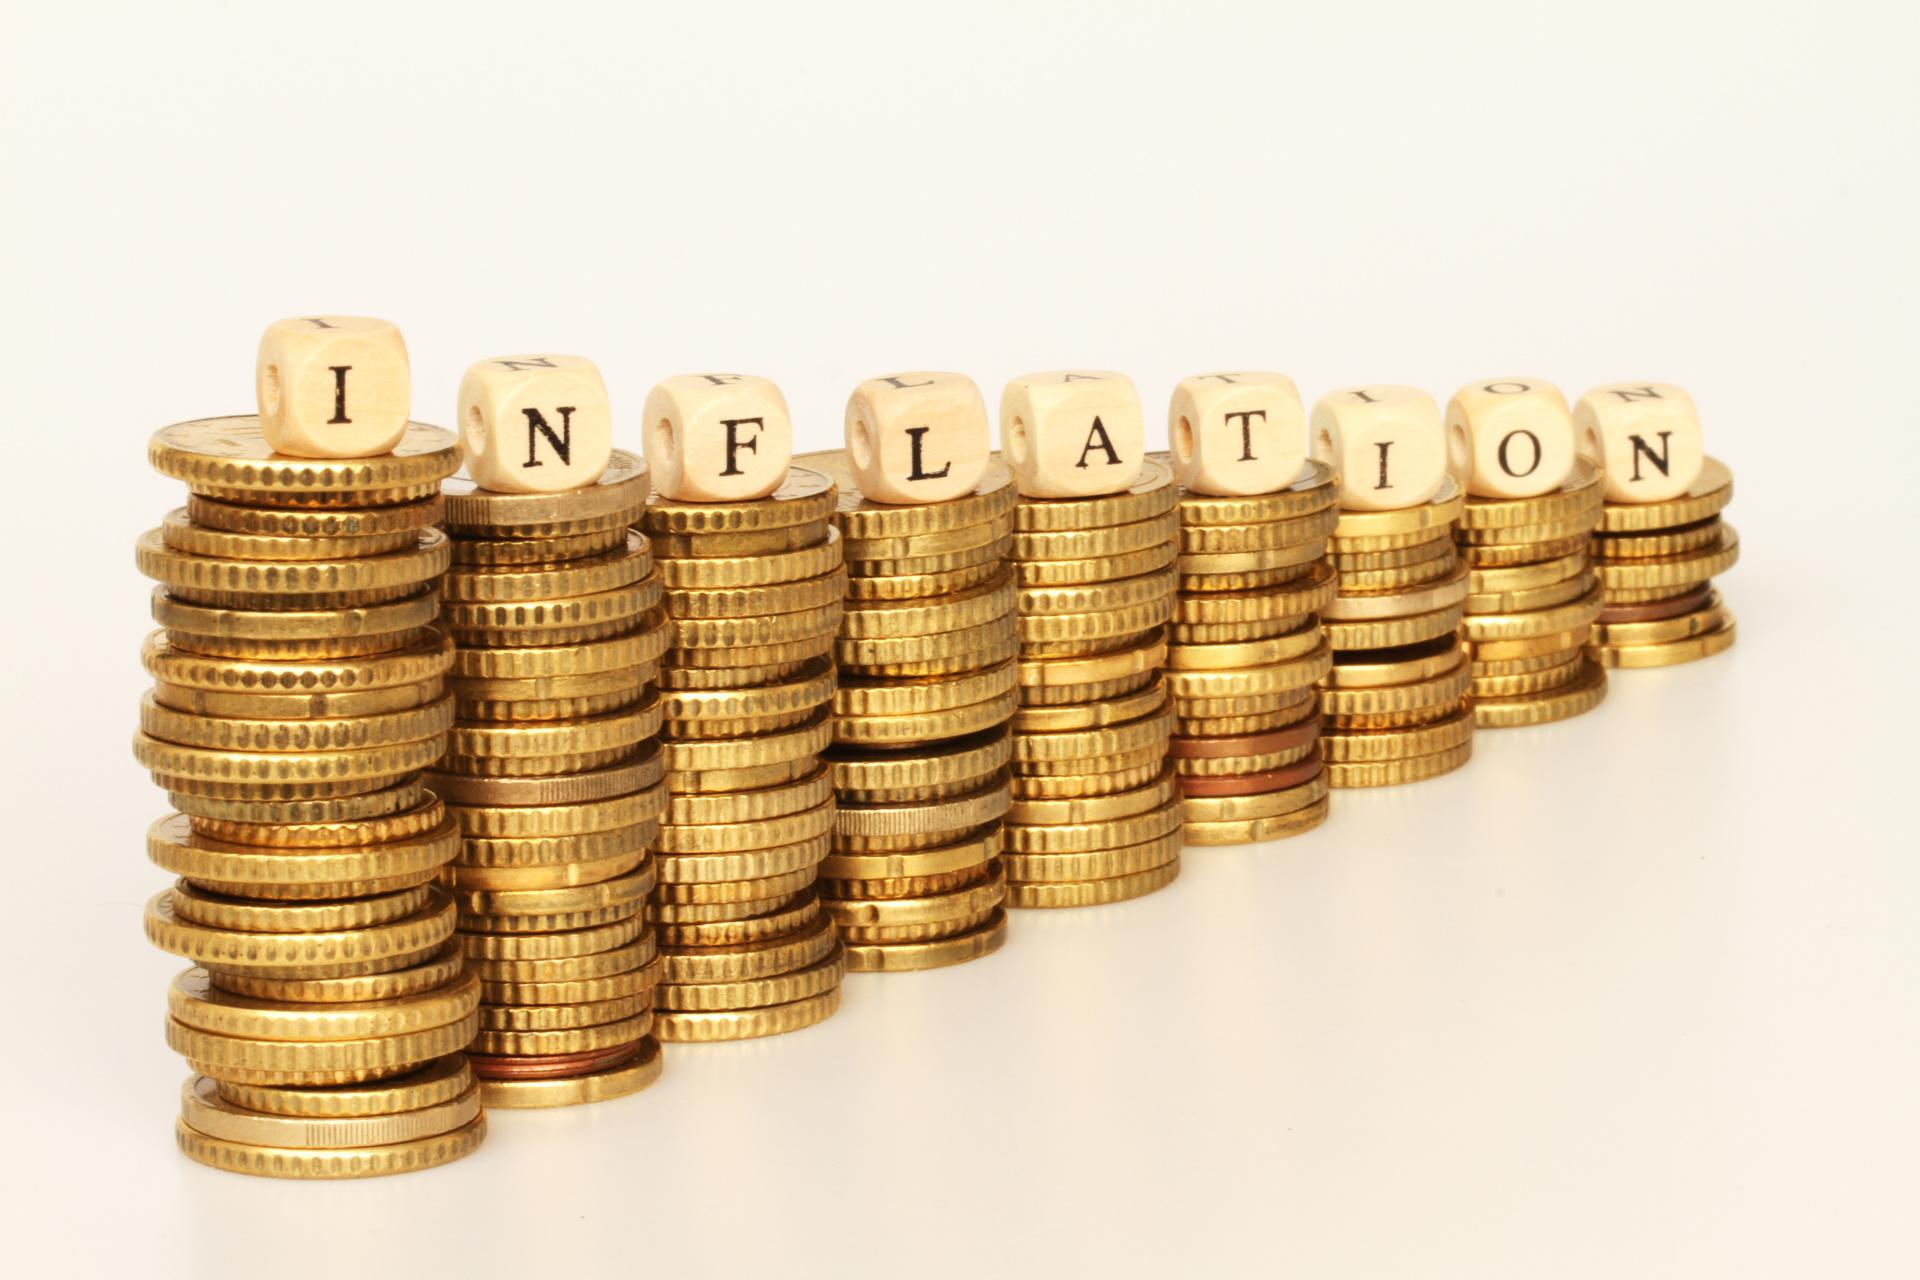 Hyperinflation: Inevitable